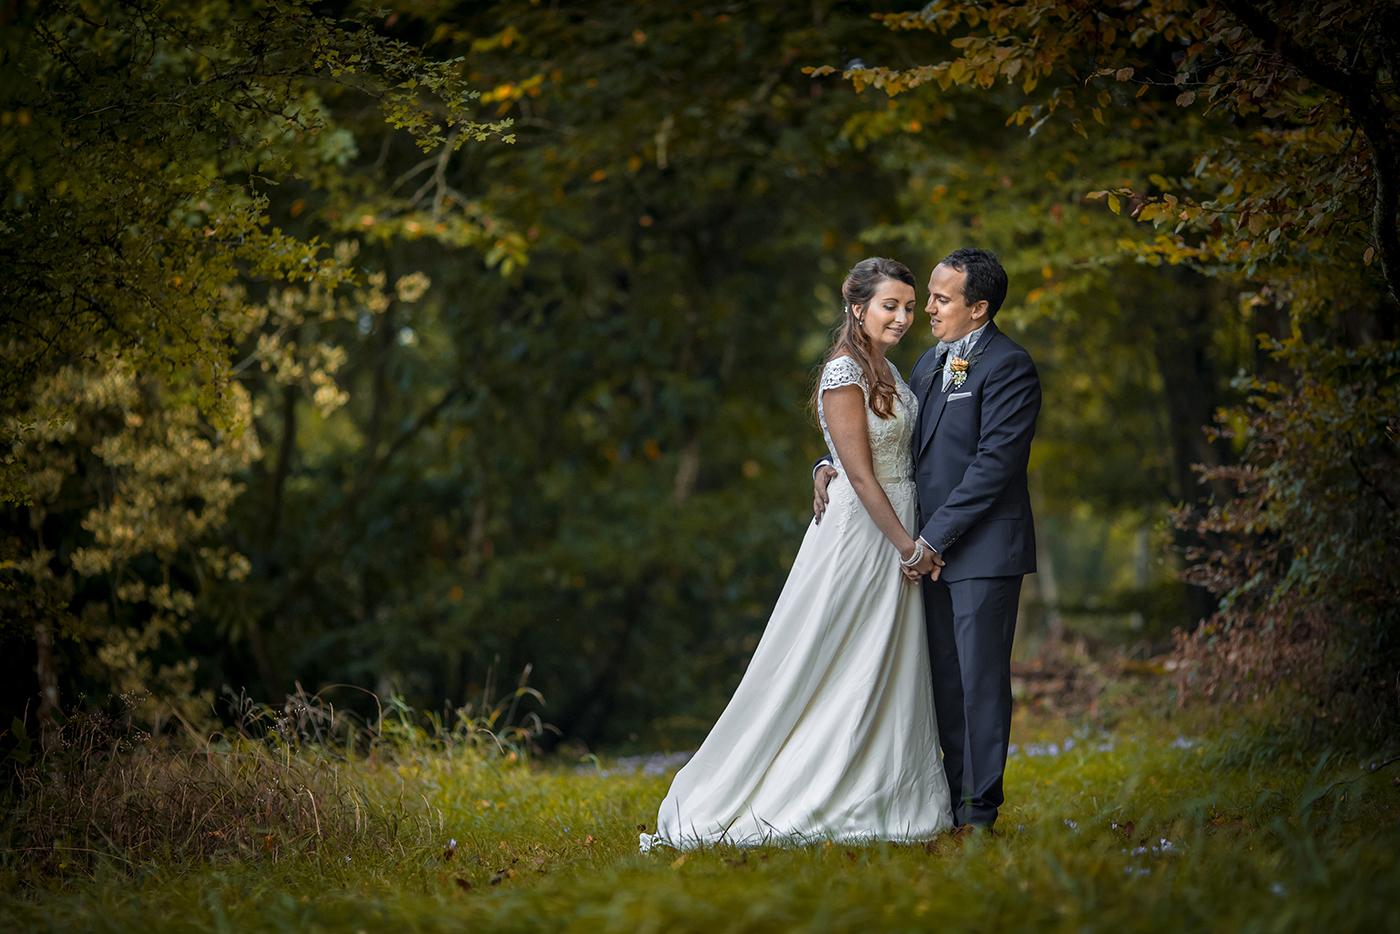 Photographe-mariage-couple-guillaume-heraud-04